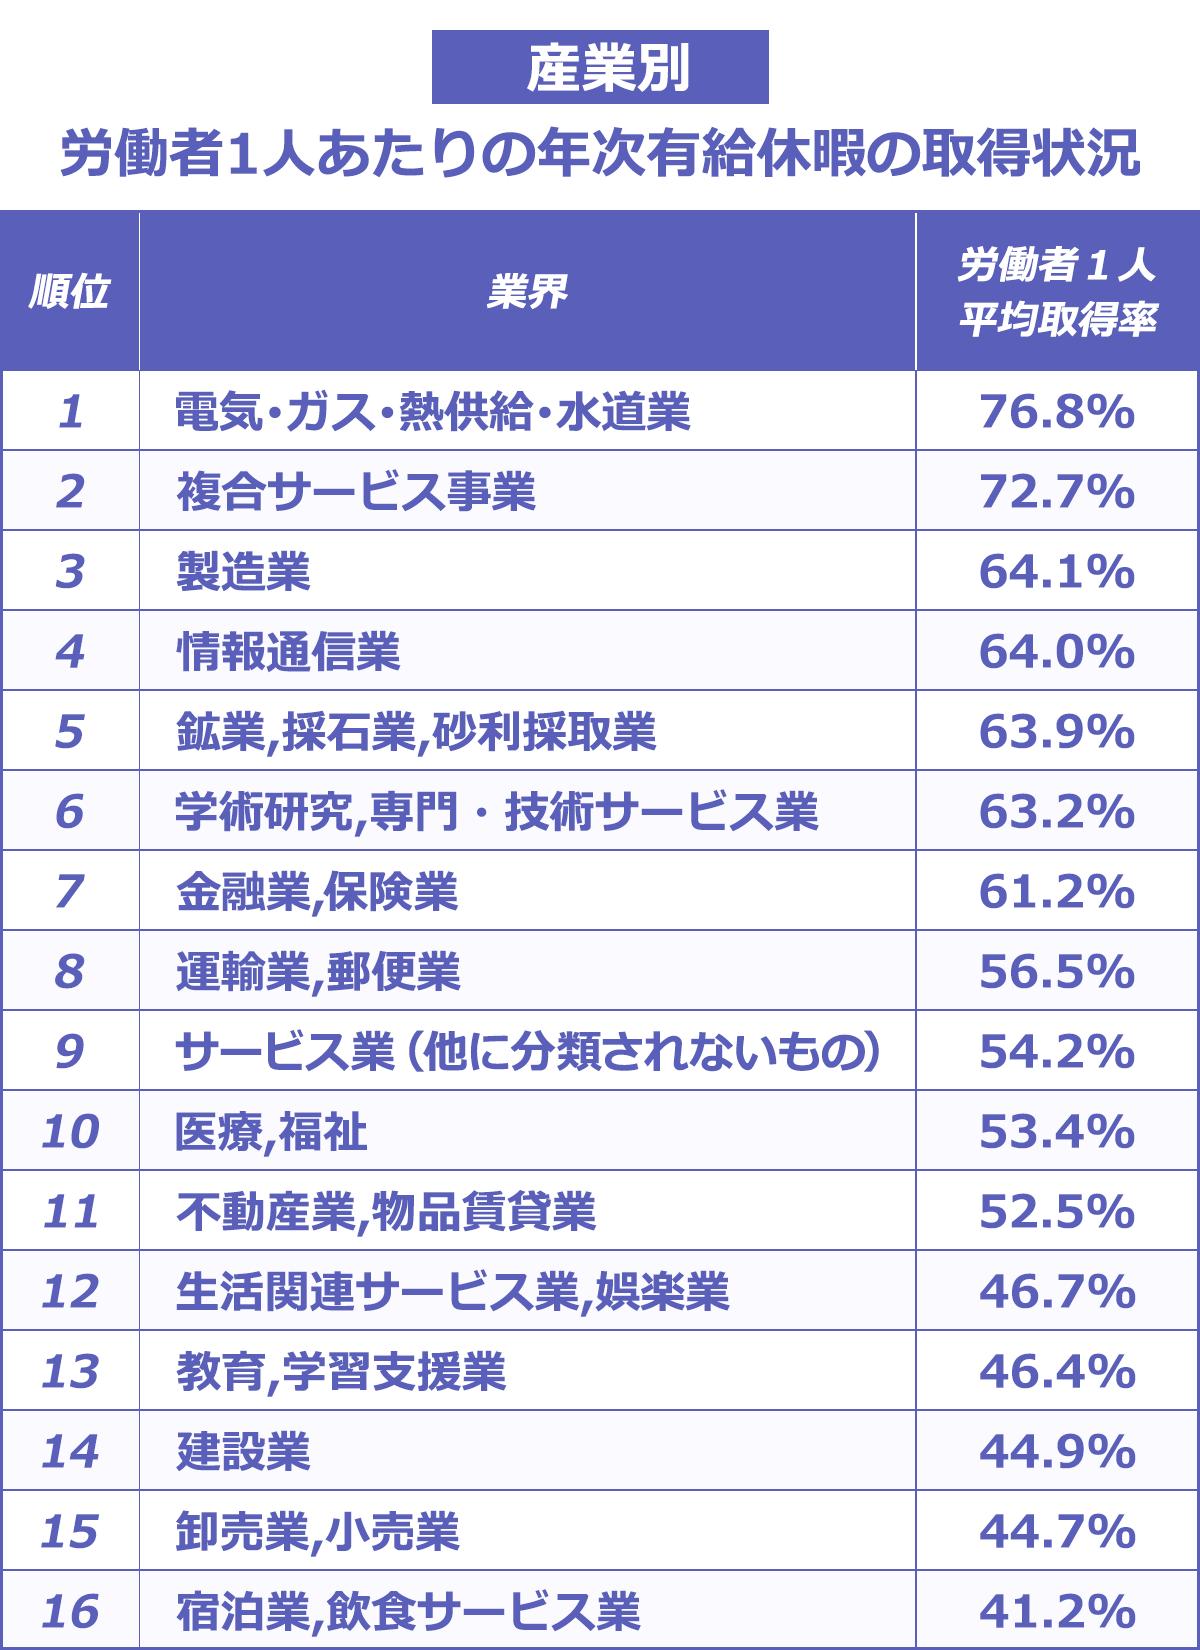 産業別労働者1人当たりの有給休暇の取得状況:(労働者1人平均取得率)電気・ガス・熱供給・水道業76.8%。複合サービス事業72.7%。製造業64.1%。 情報通信業64.0%。 鉱業,採石業,砂利採取業63.9%。 学術研究,専門・技術サービス業63.2%。 金融業,保険業61.2%。 運輸業,郵便業56.5%。サービス業(他に分類されないもの)54.2%。医療,福祉53.4%。不動産業,物品賃貸業52.5%。生活関連サービス業,娯楽業46.7%。教育,学習支援業46.4%。建設業44.9%。卸売業,小売業44.7%。宿泊業,飲食サービス業41.2%。